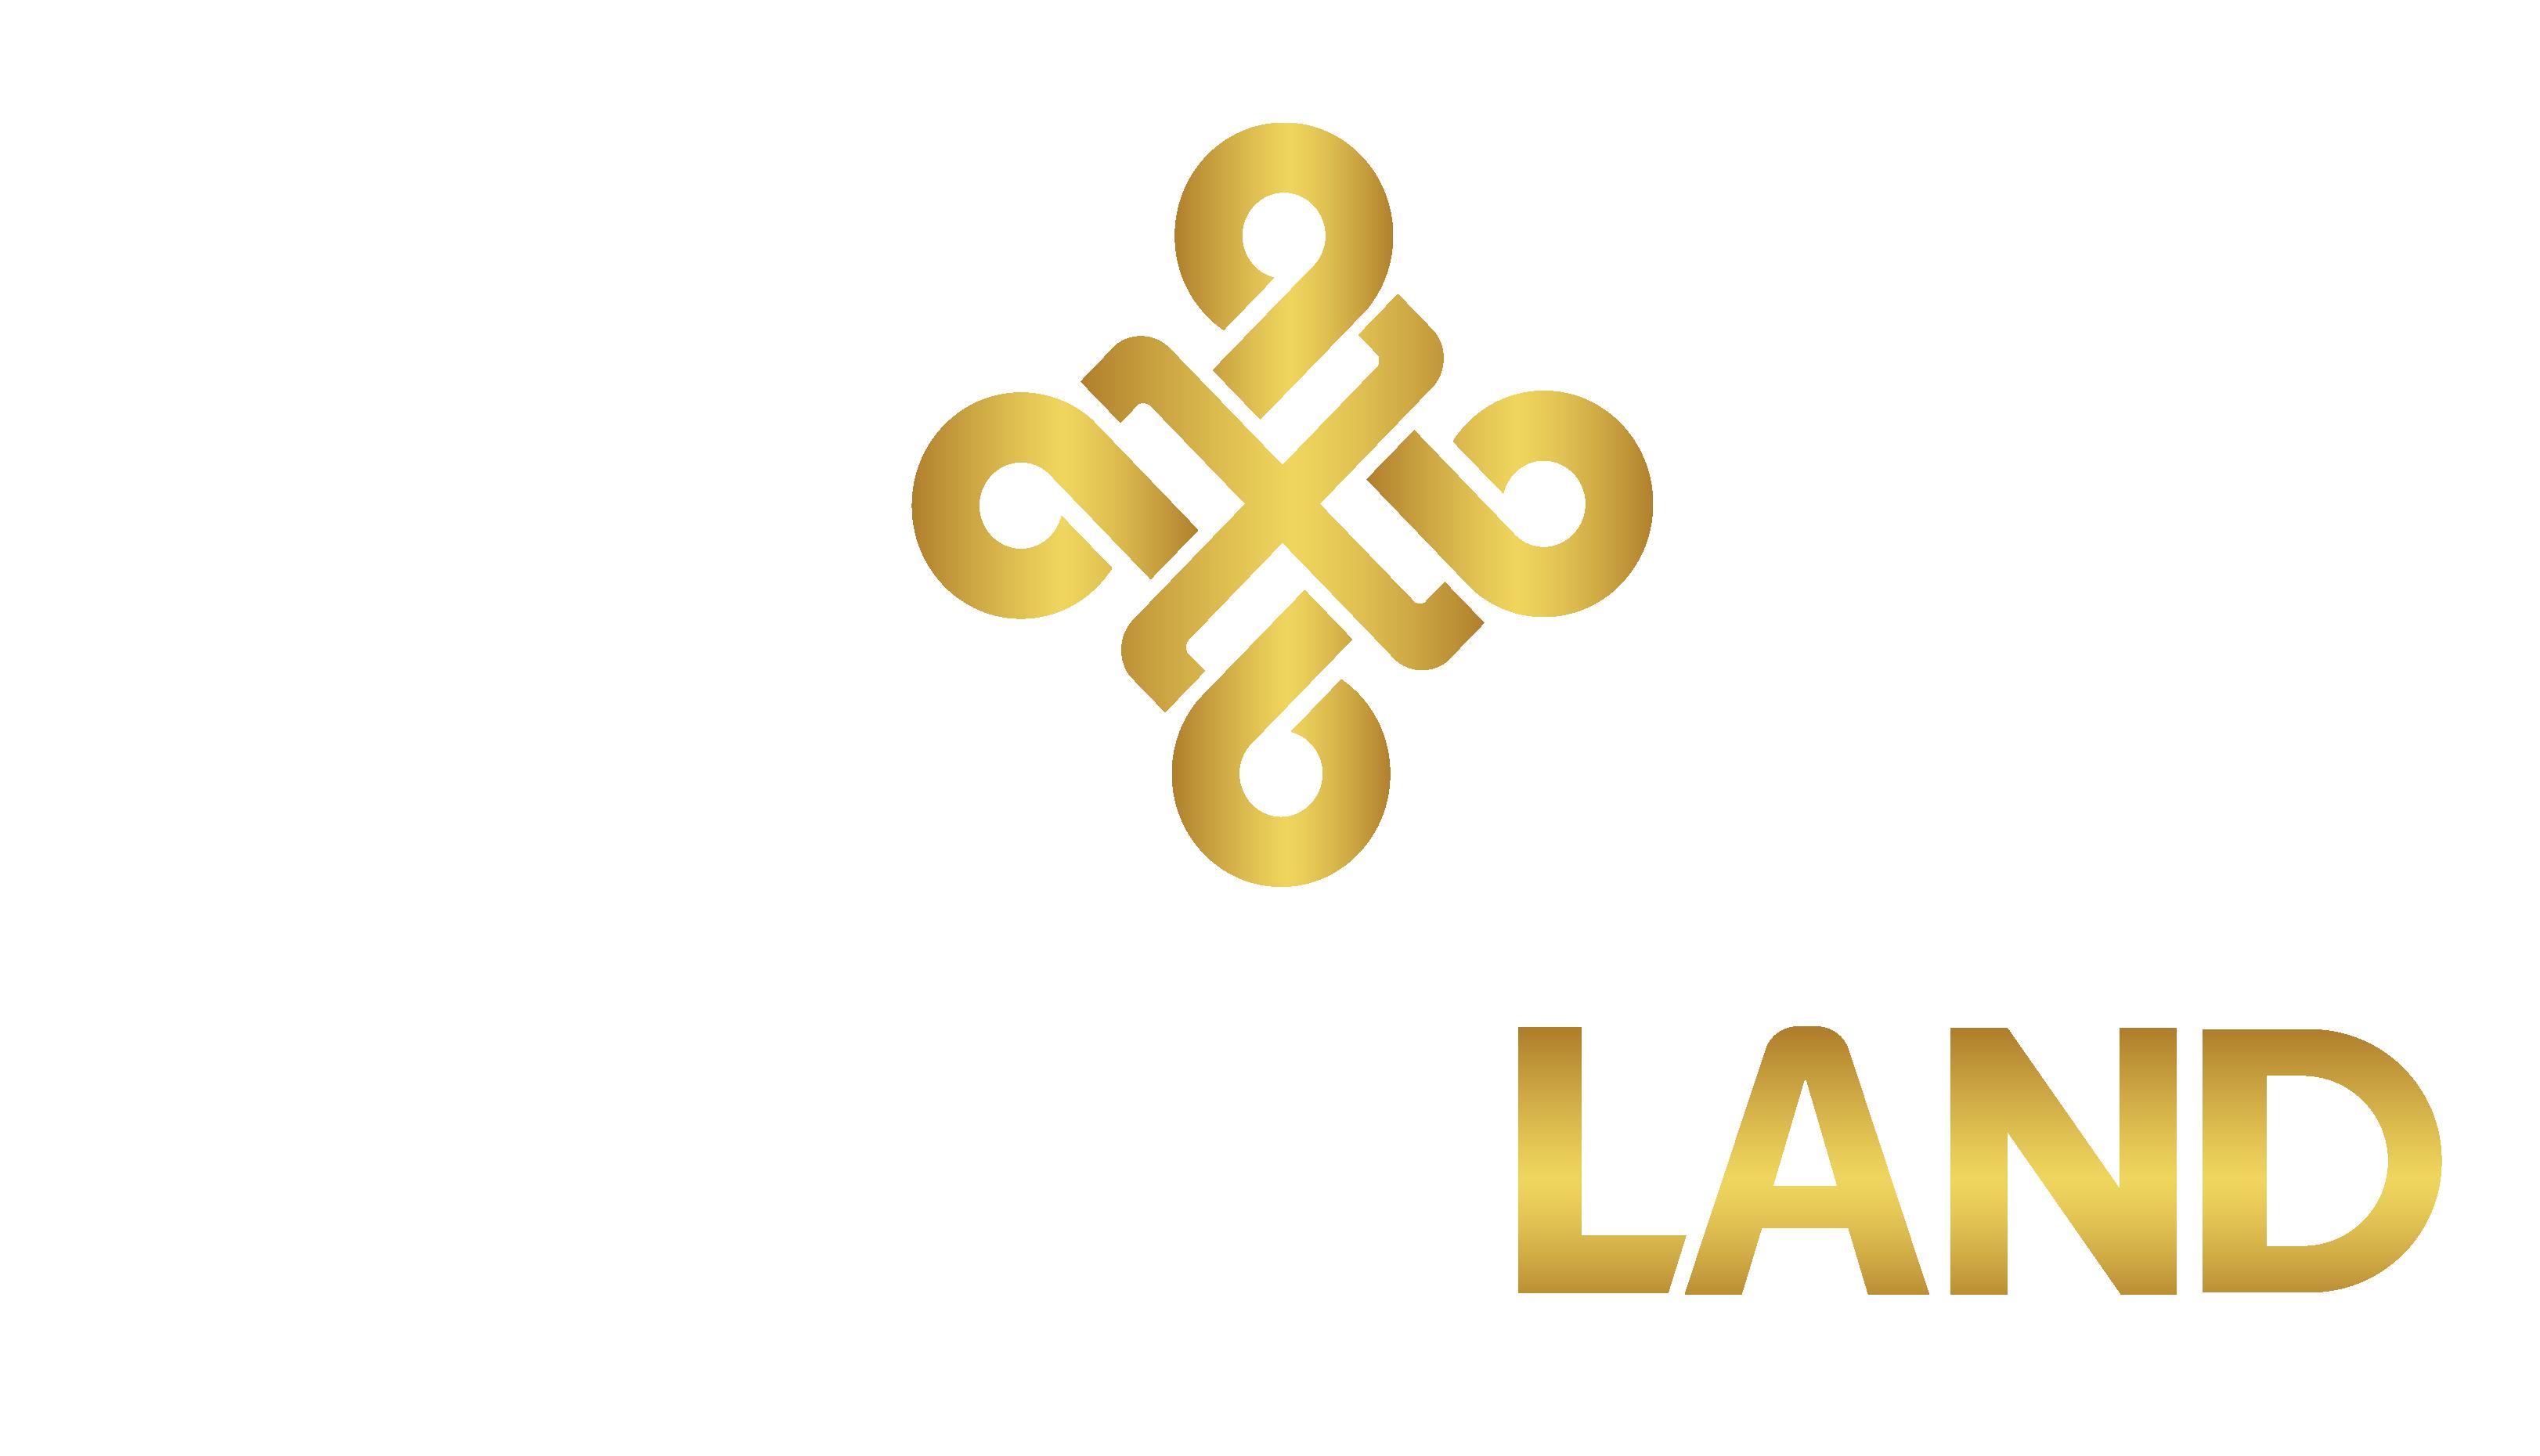 Khang Land